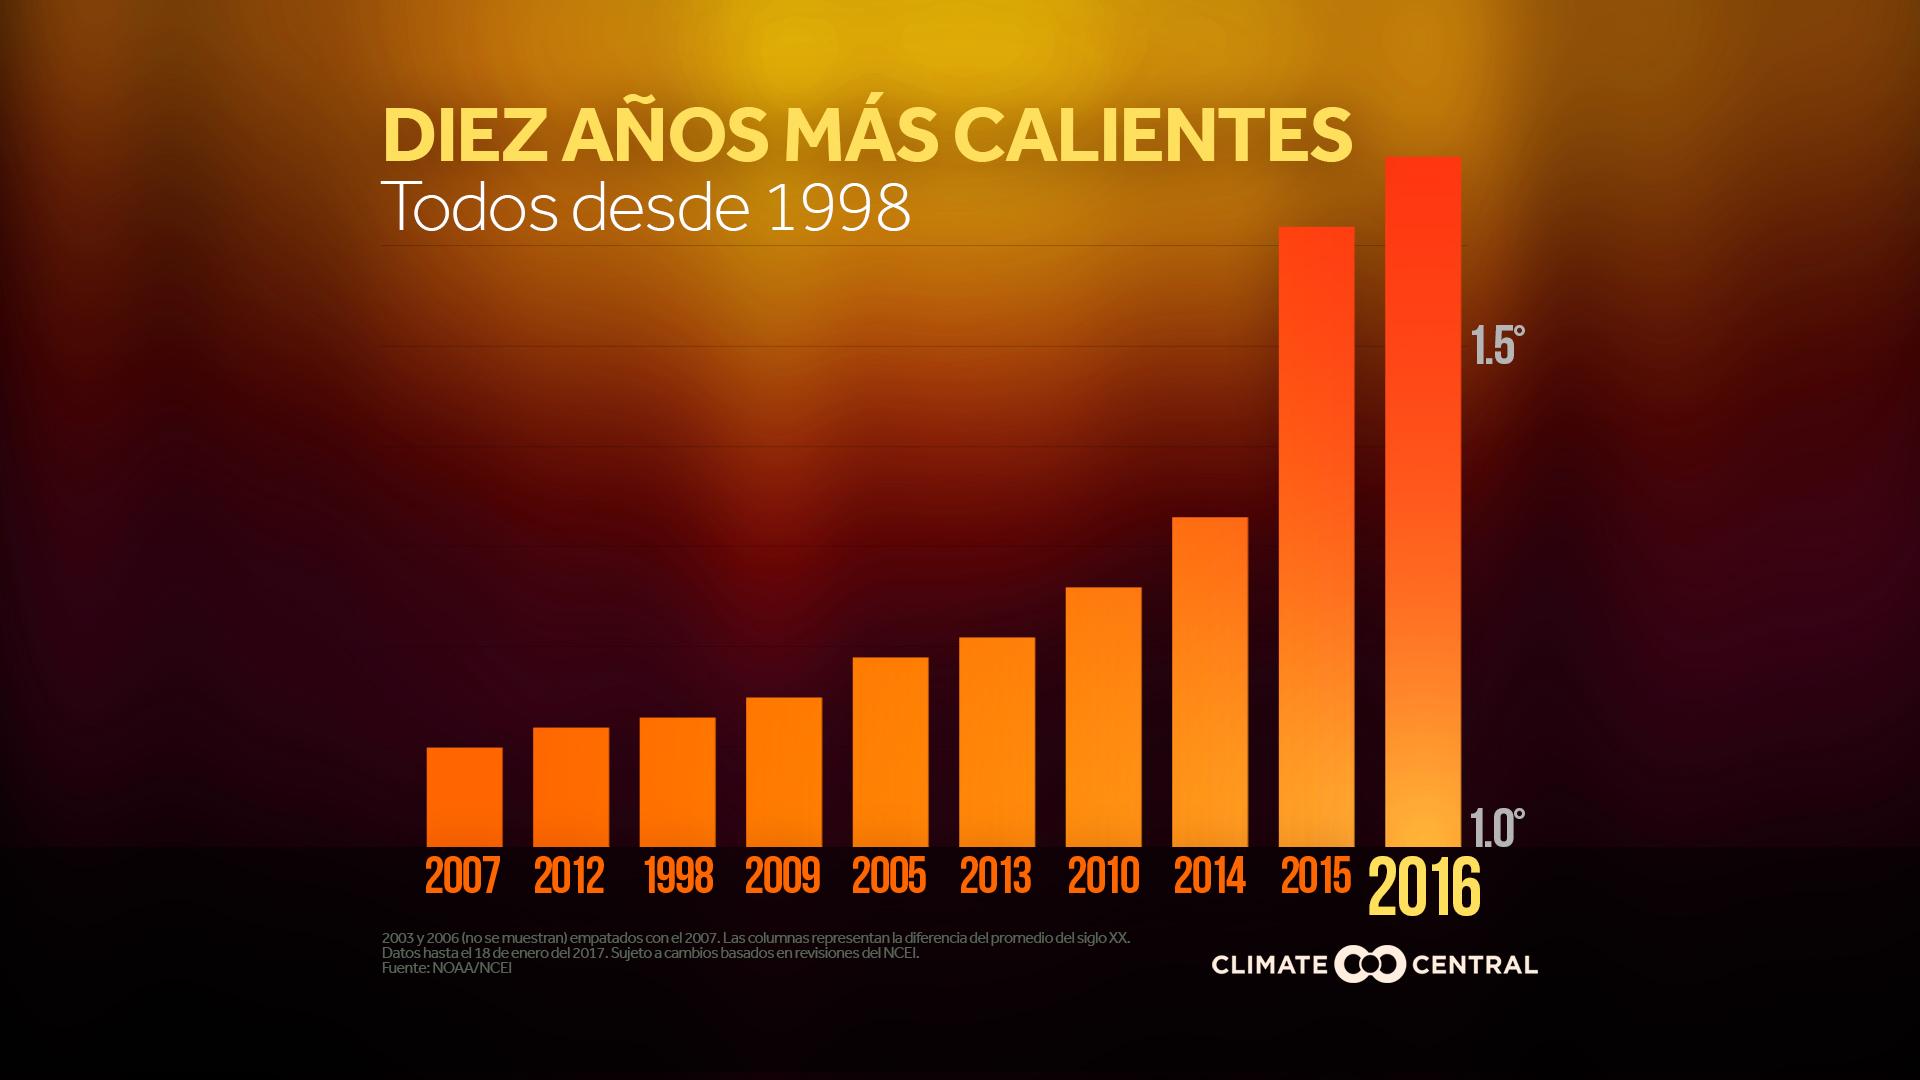 2016 hottest year